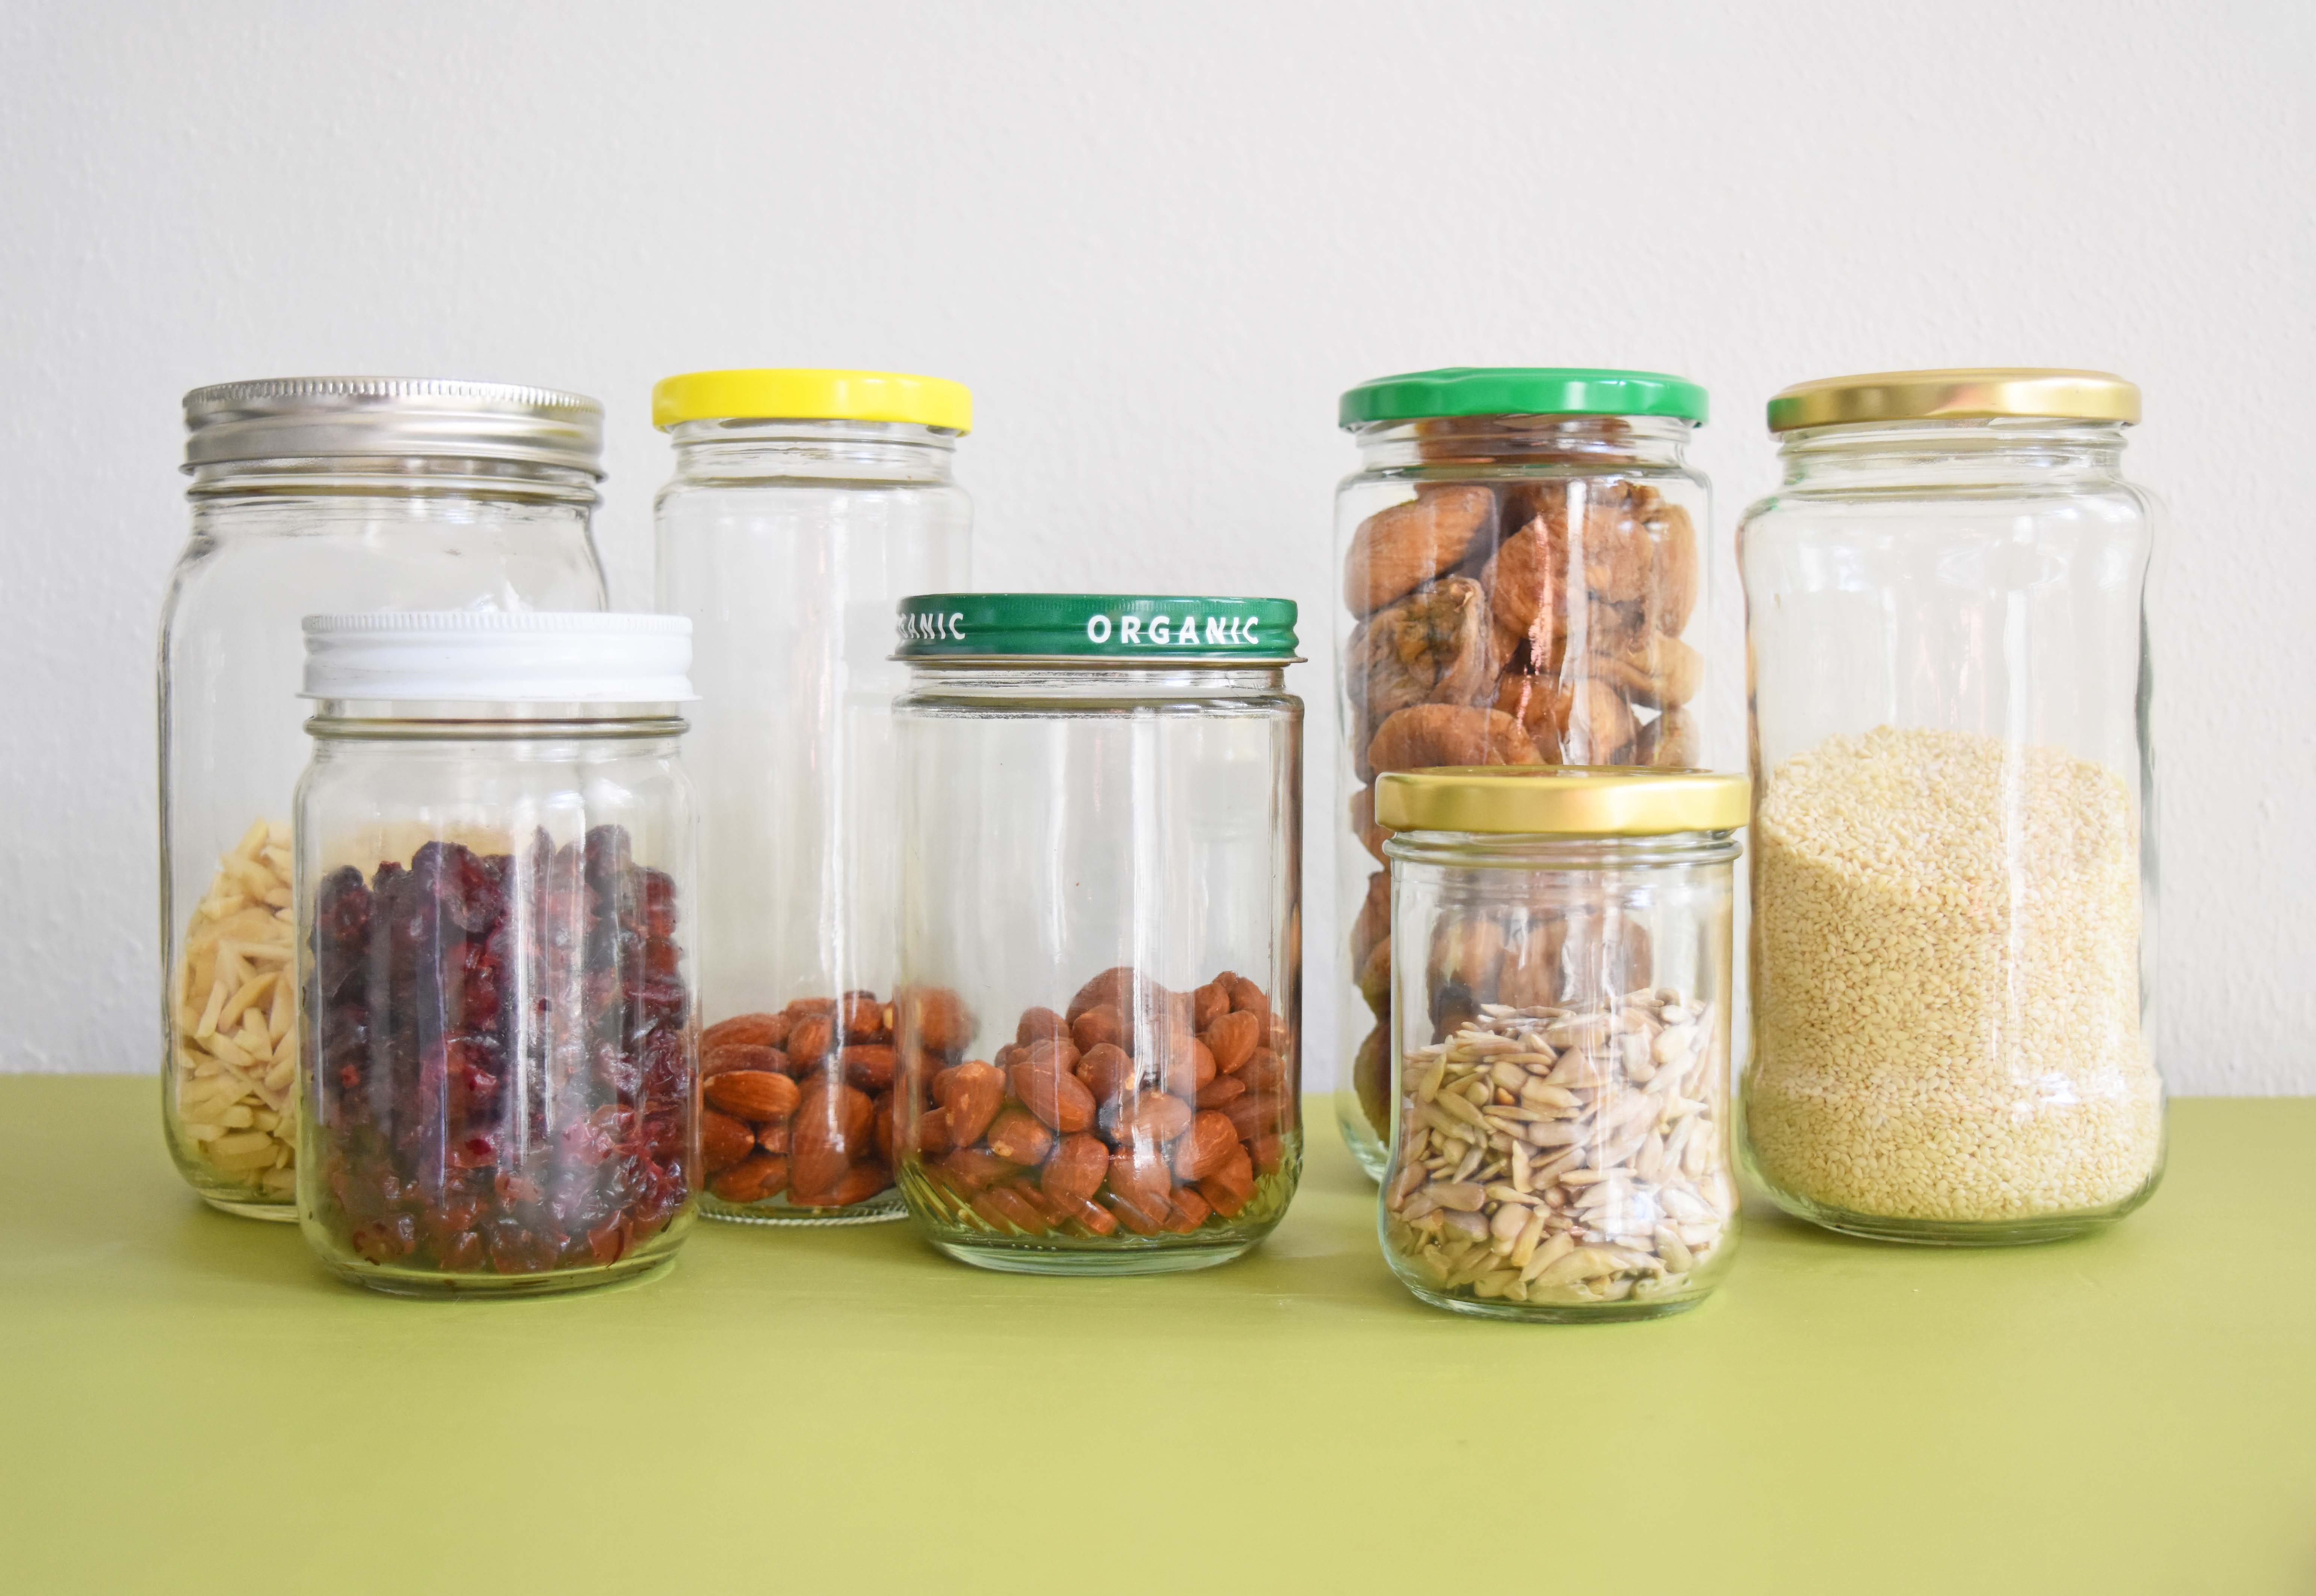 The 19 Ways I Reuse Food Glass Jars Around My Home Once Again My Dear Irene